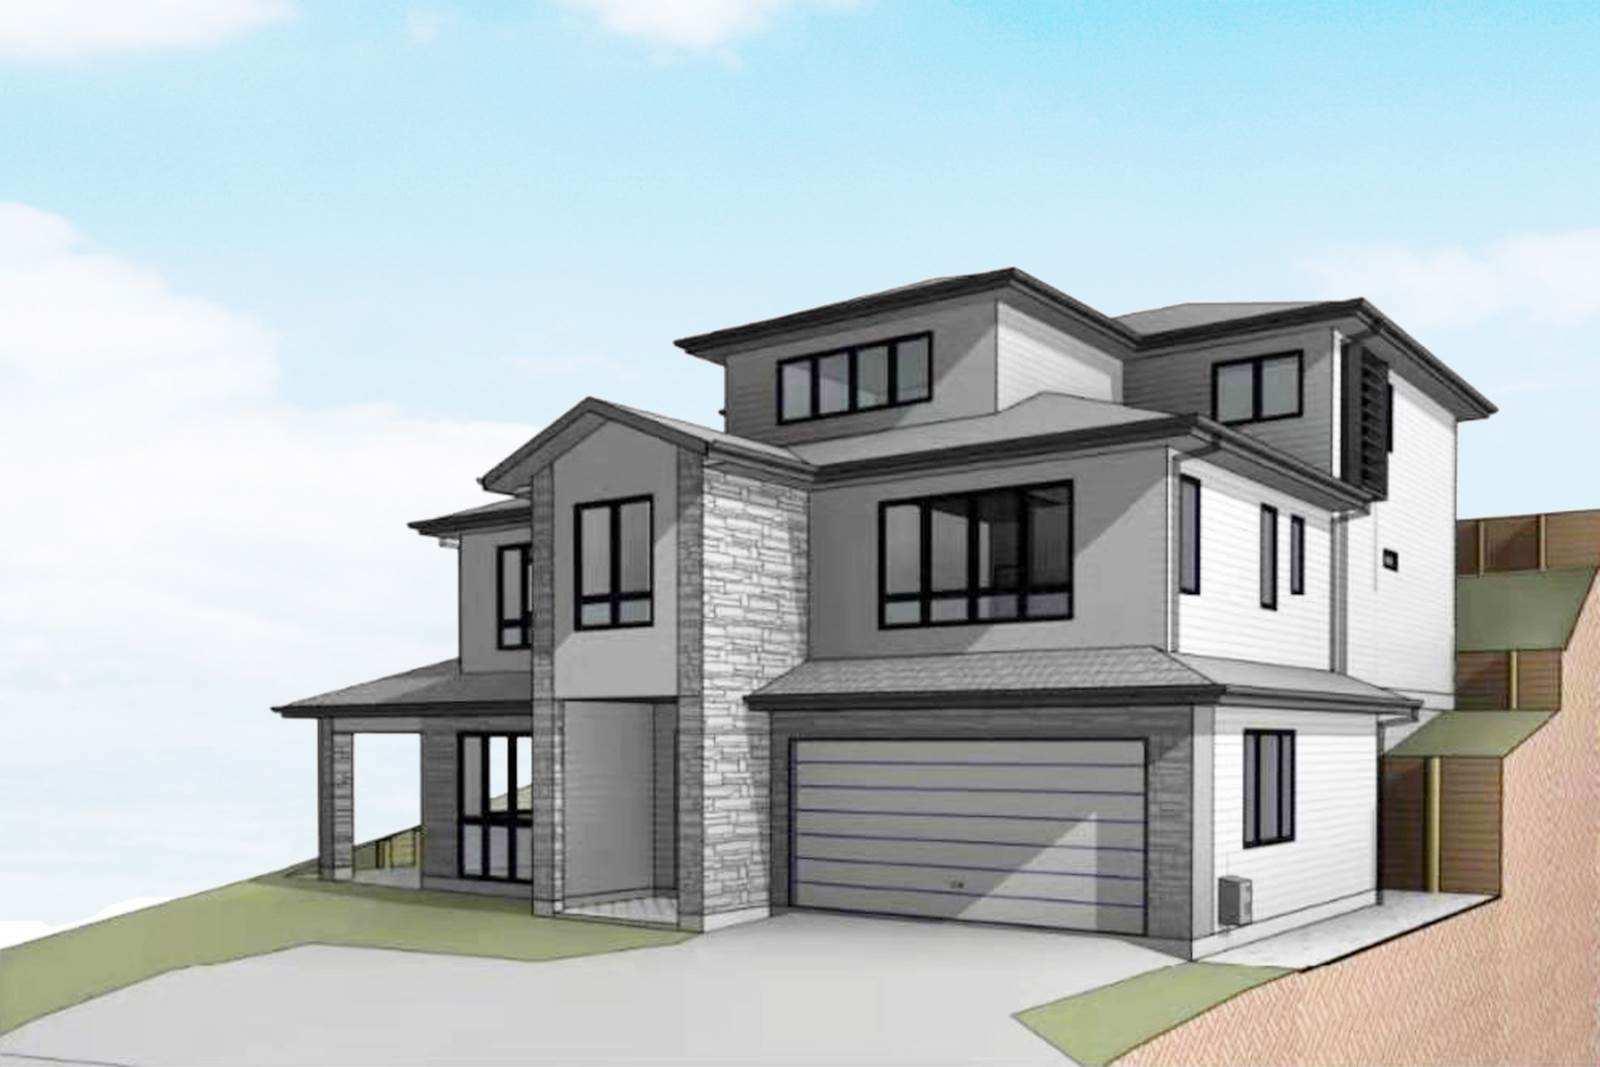 Pinehill 7房 全新奢居+祖母房 10年建筑质保 高规格设计 靠近海滩&商圈 轻松上高速! Luxury Brand New Home+Granny Flat In Pinehill